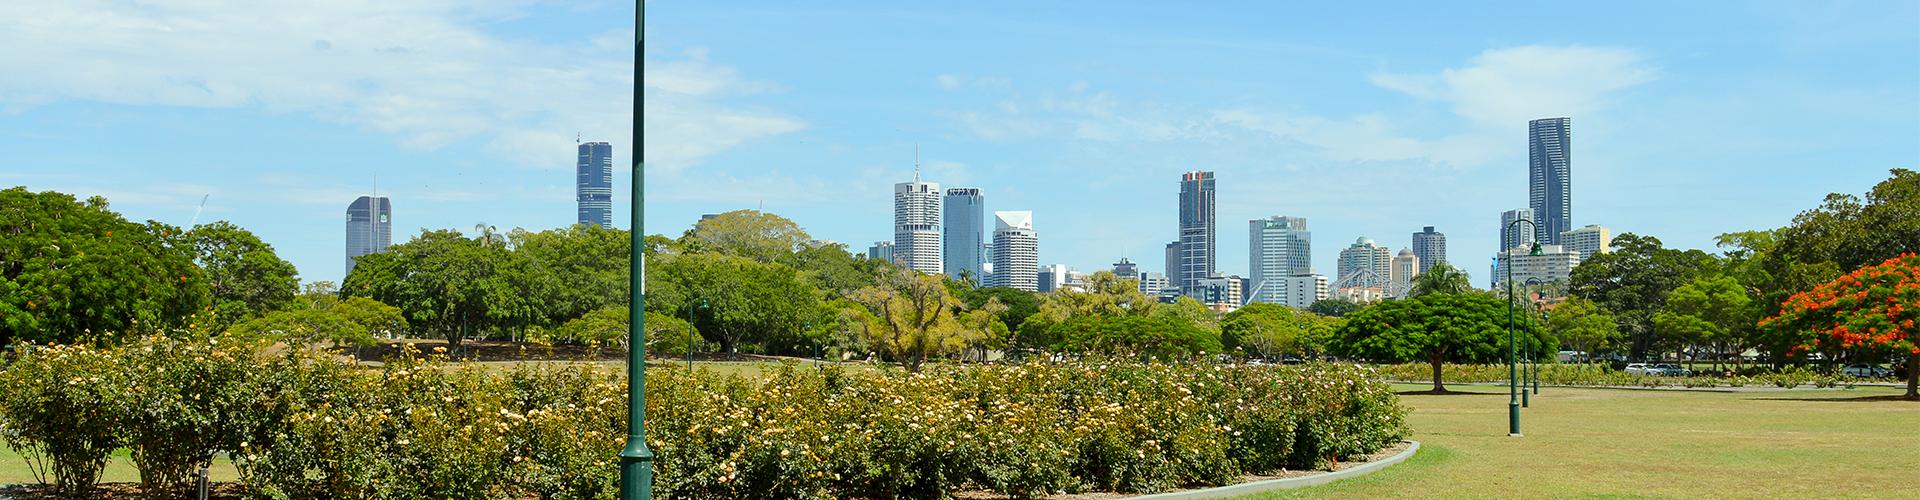 Header Image - New Farm park and Brisbane skyline-1